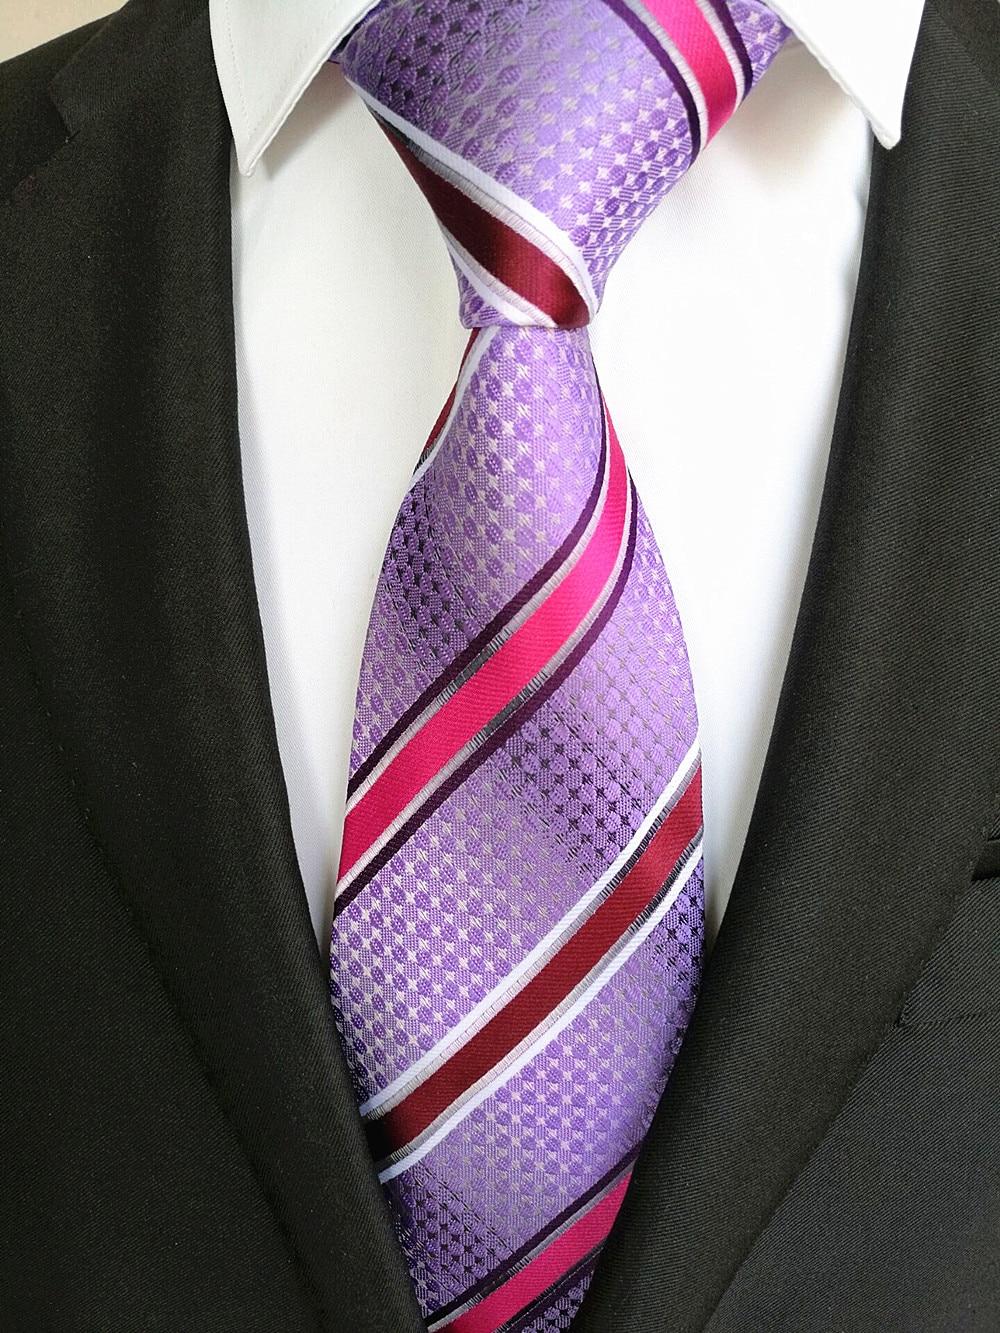 Neck Bowtie Tie Male Formal Wear Business Tie Groom Wedding Marriage Tie Silk Fabrics red Pattern Tie Gentleman Fashion Accessory